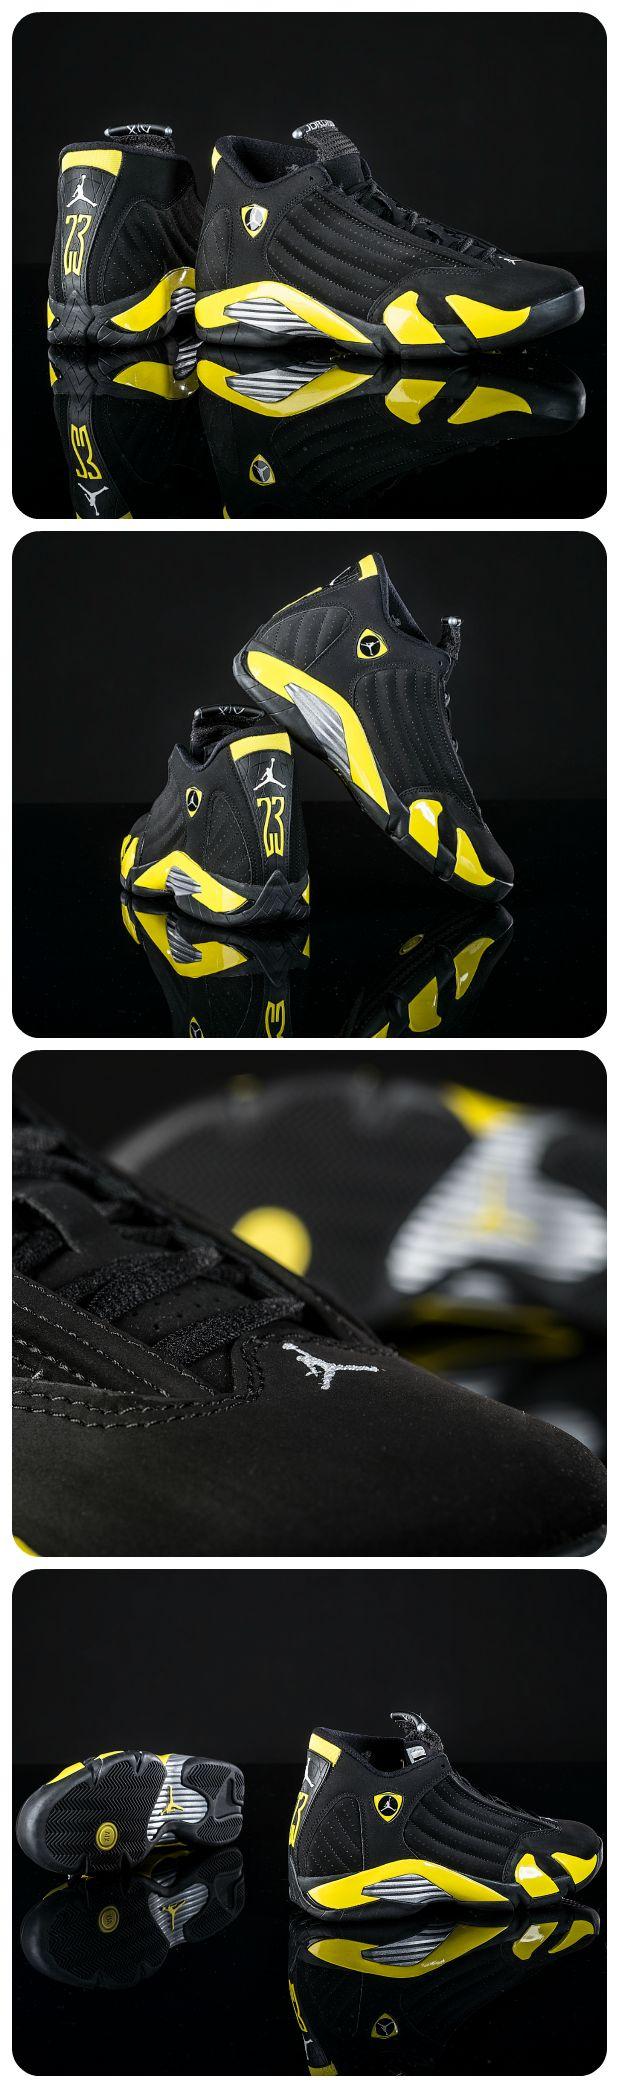 Ferrari-inspired Jordan shoes speed back onto the scene. Get details on the Retro 14 here! #Sneakers